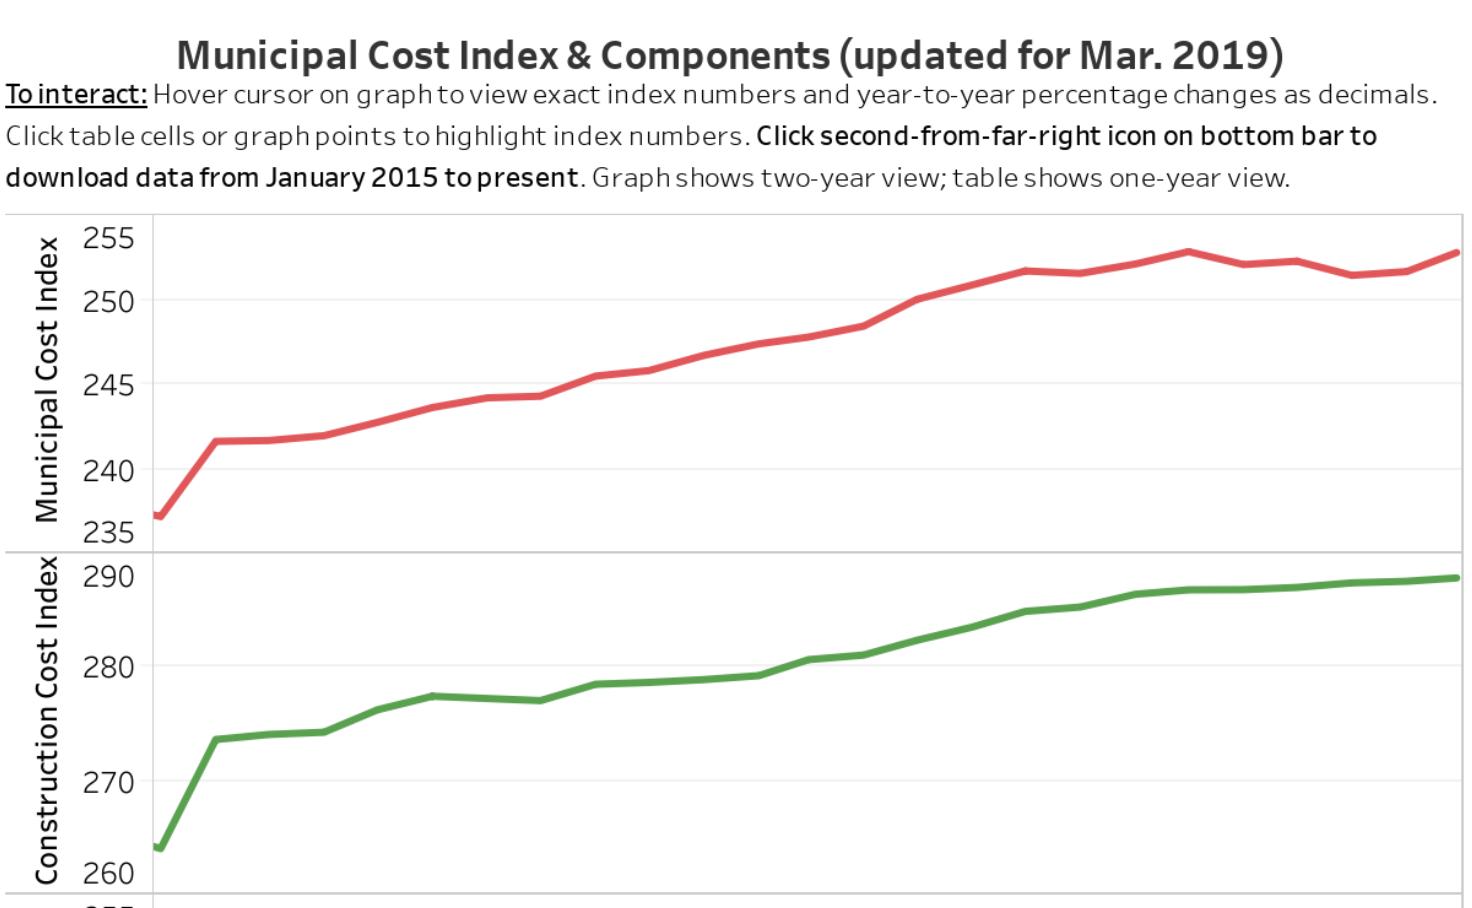 Municipal Cost Index - Jason Axelrod | Tableau Public